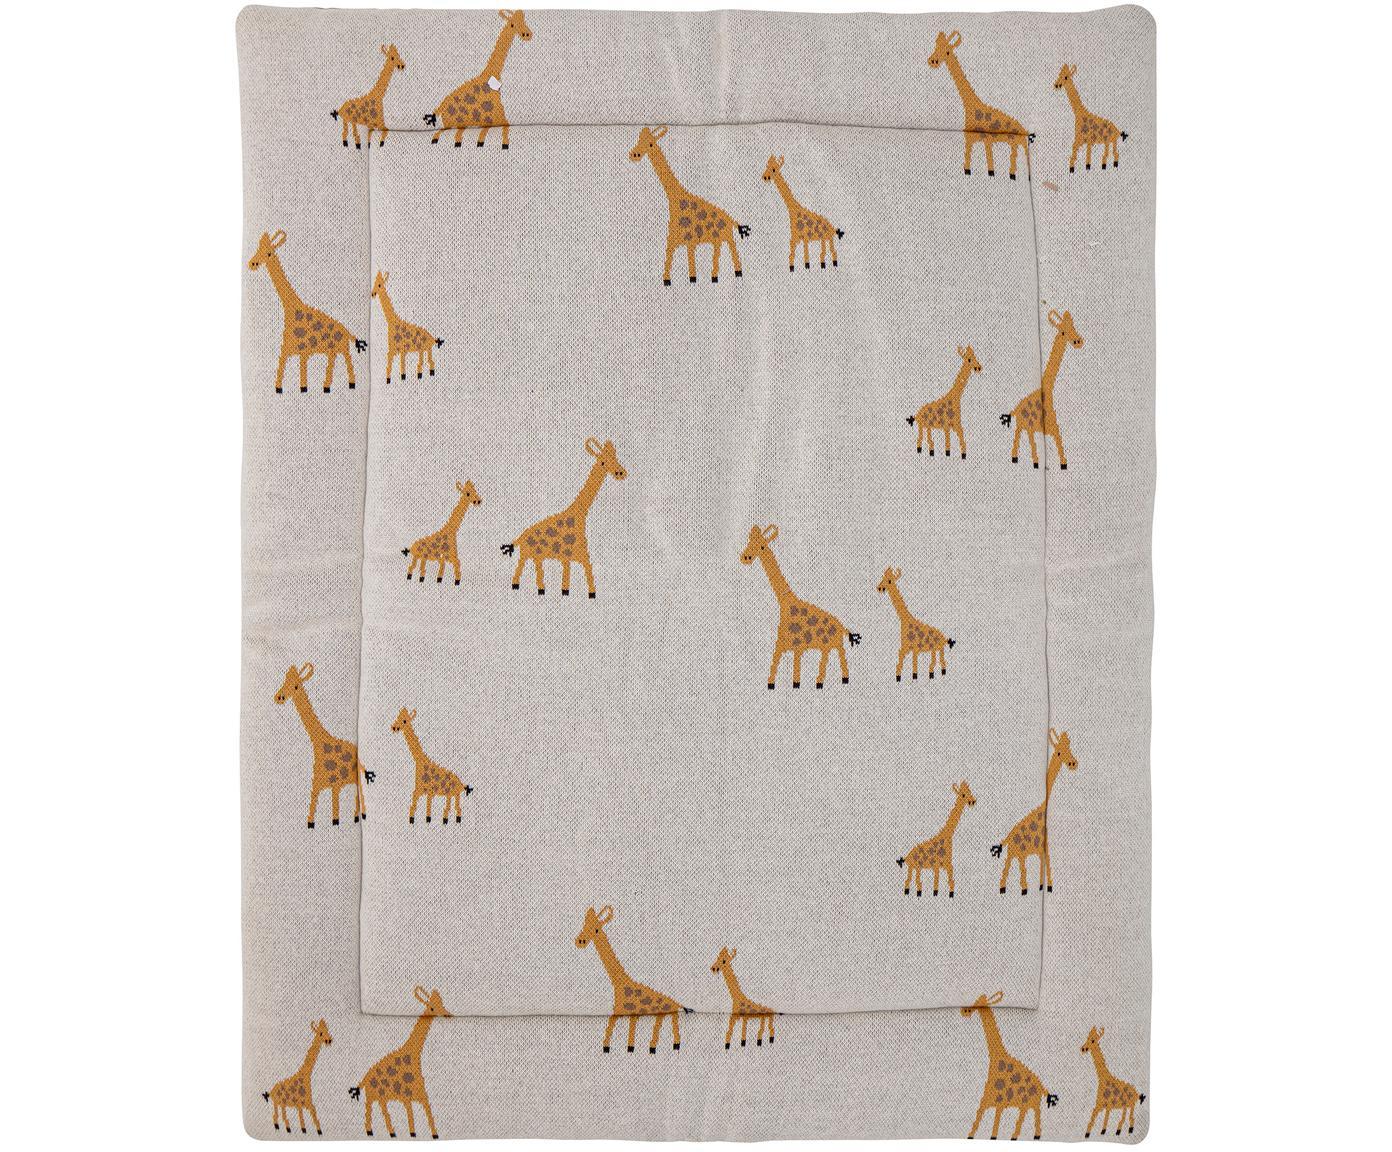 Manta Giraffe, Tapizado: algodón, certificado Oeko, Beige, An 77 x L 100 cm